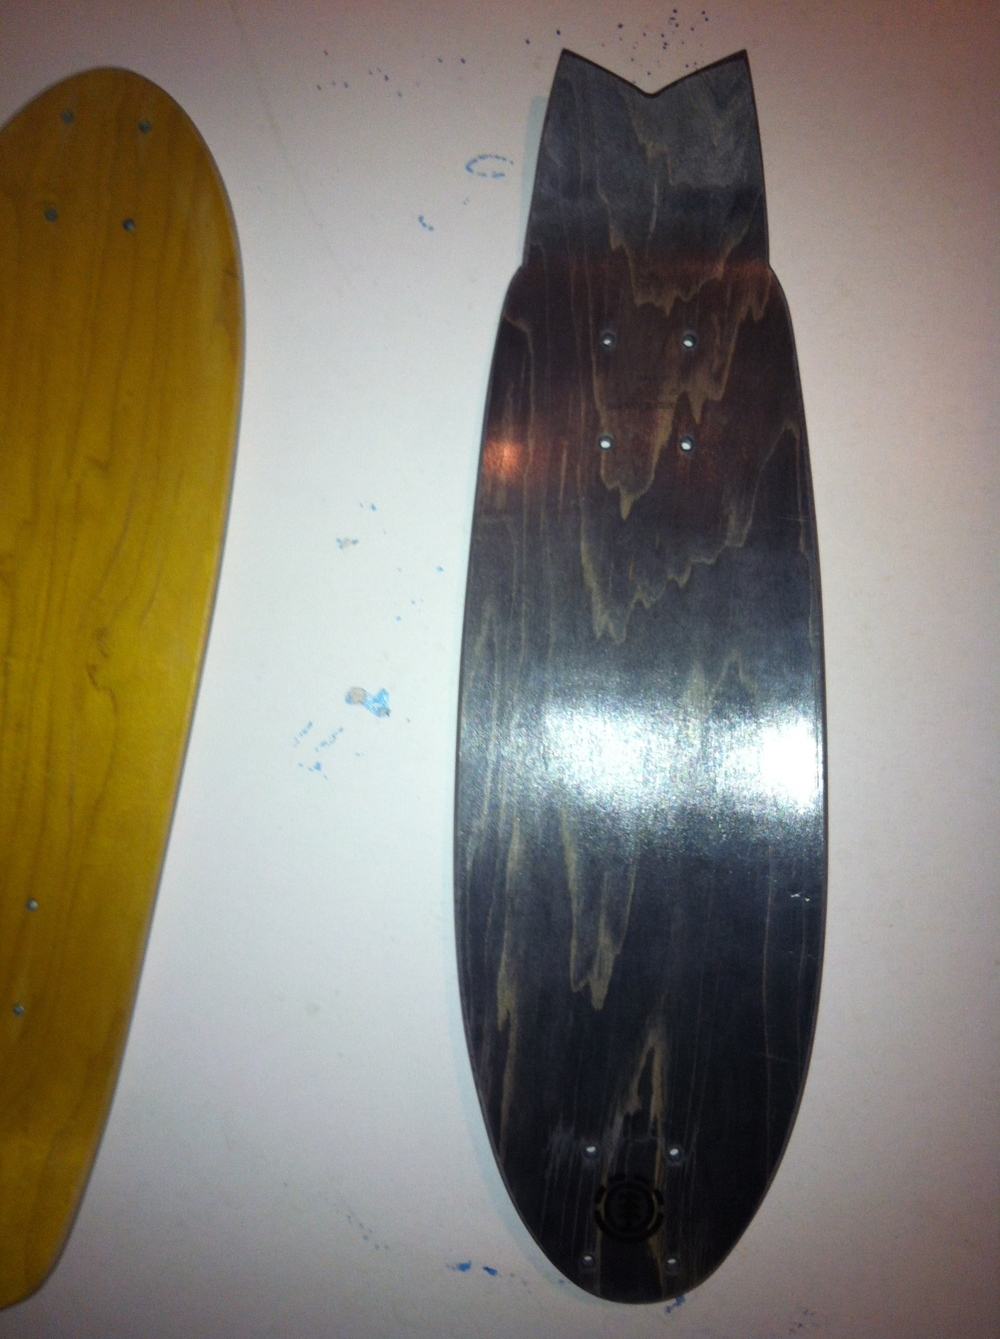 recycled 7 ply skateboards > cruiser & fish decks